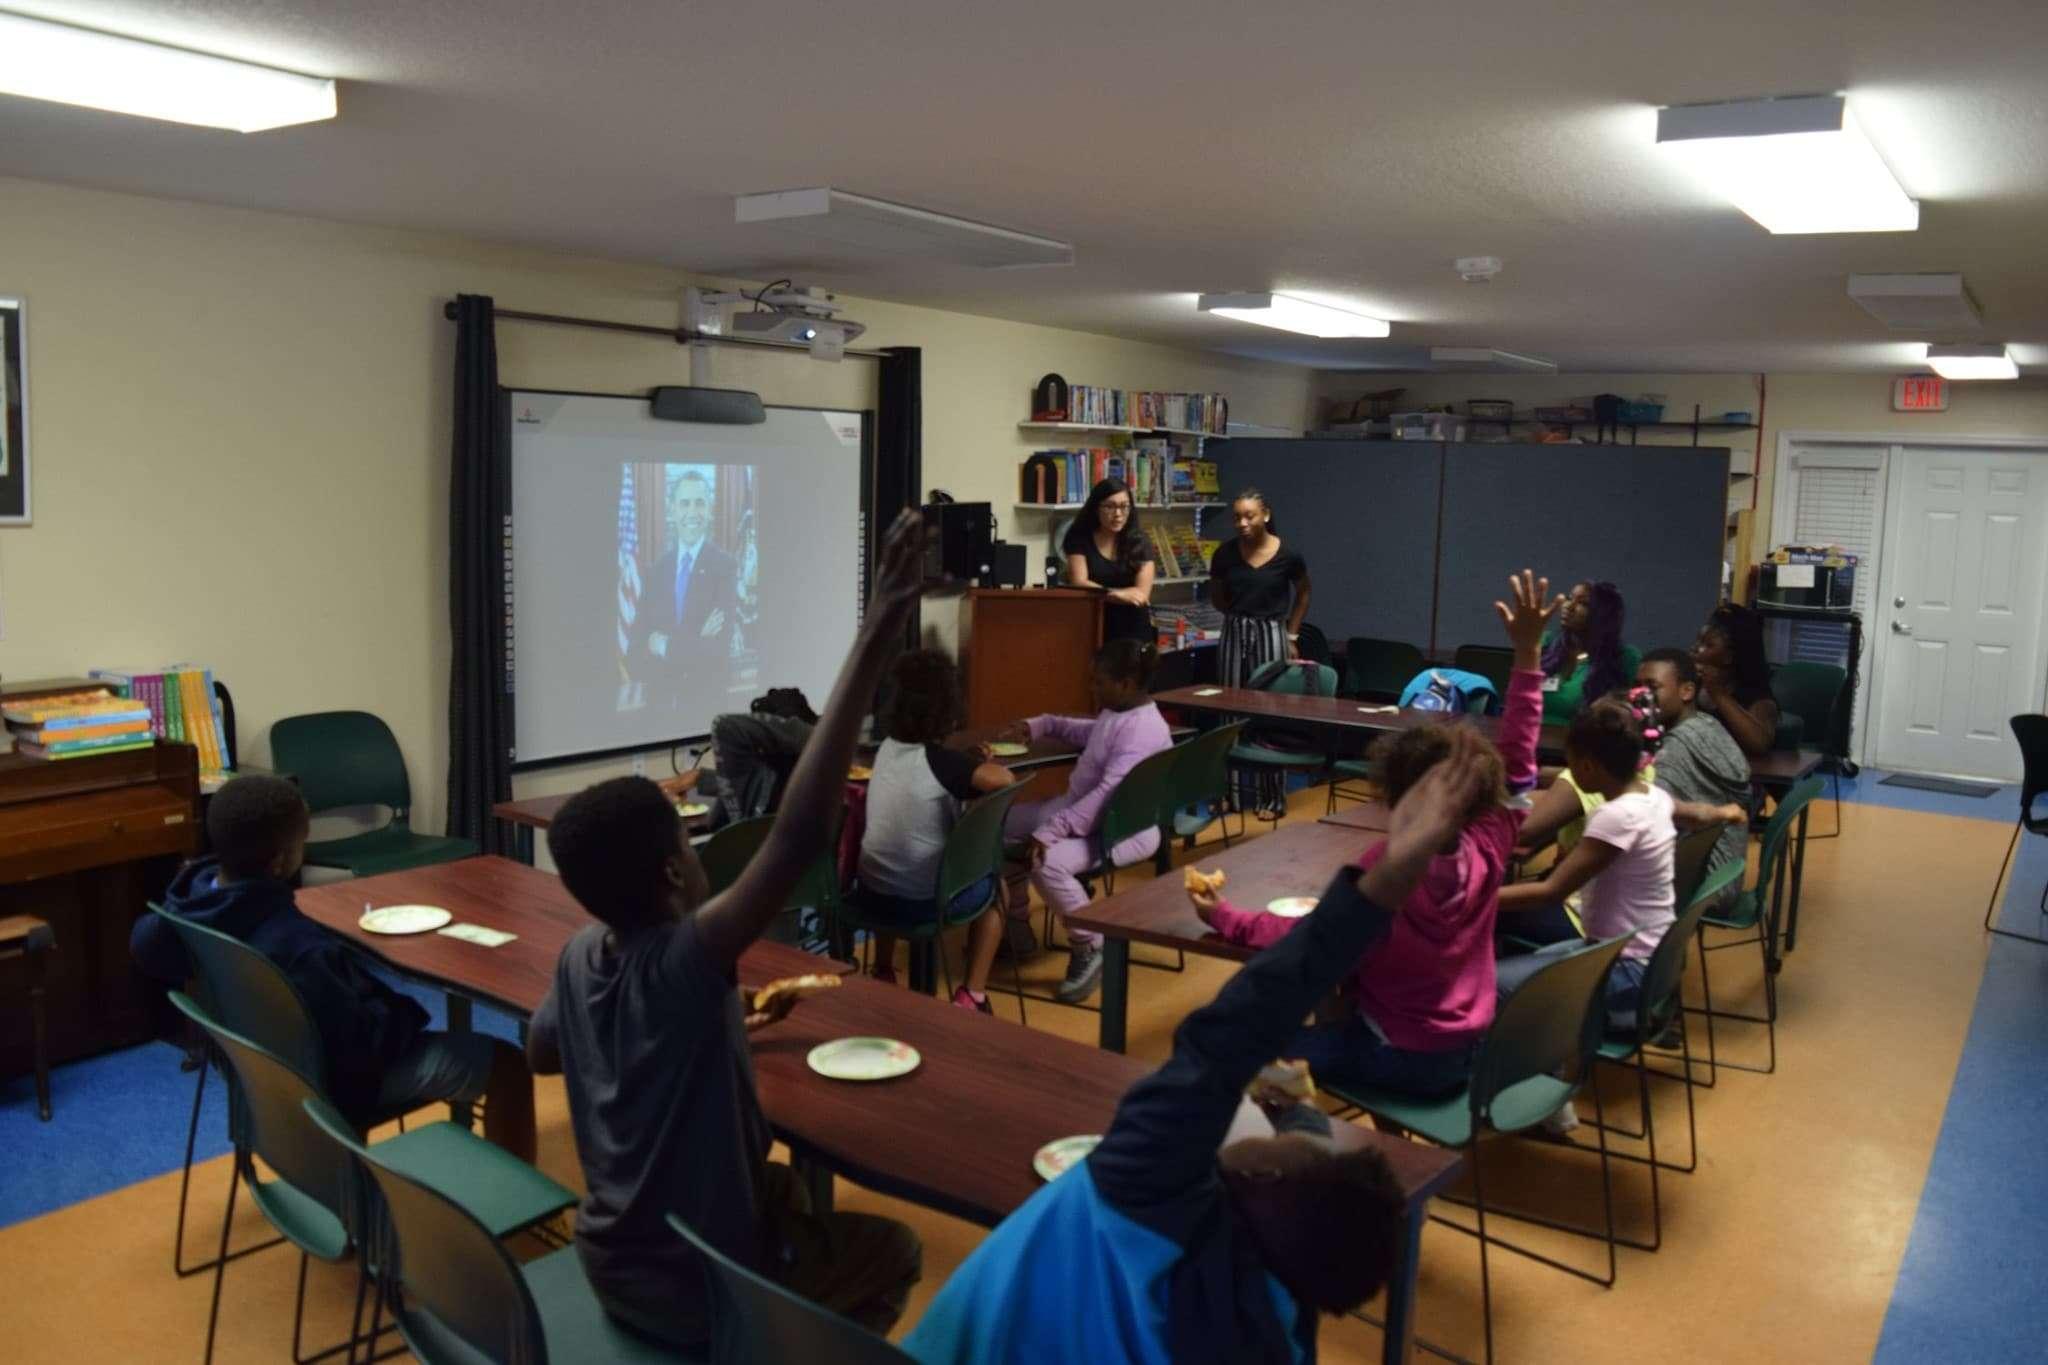 Children raising their hands from their seats during a children's program inside the FRC